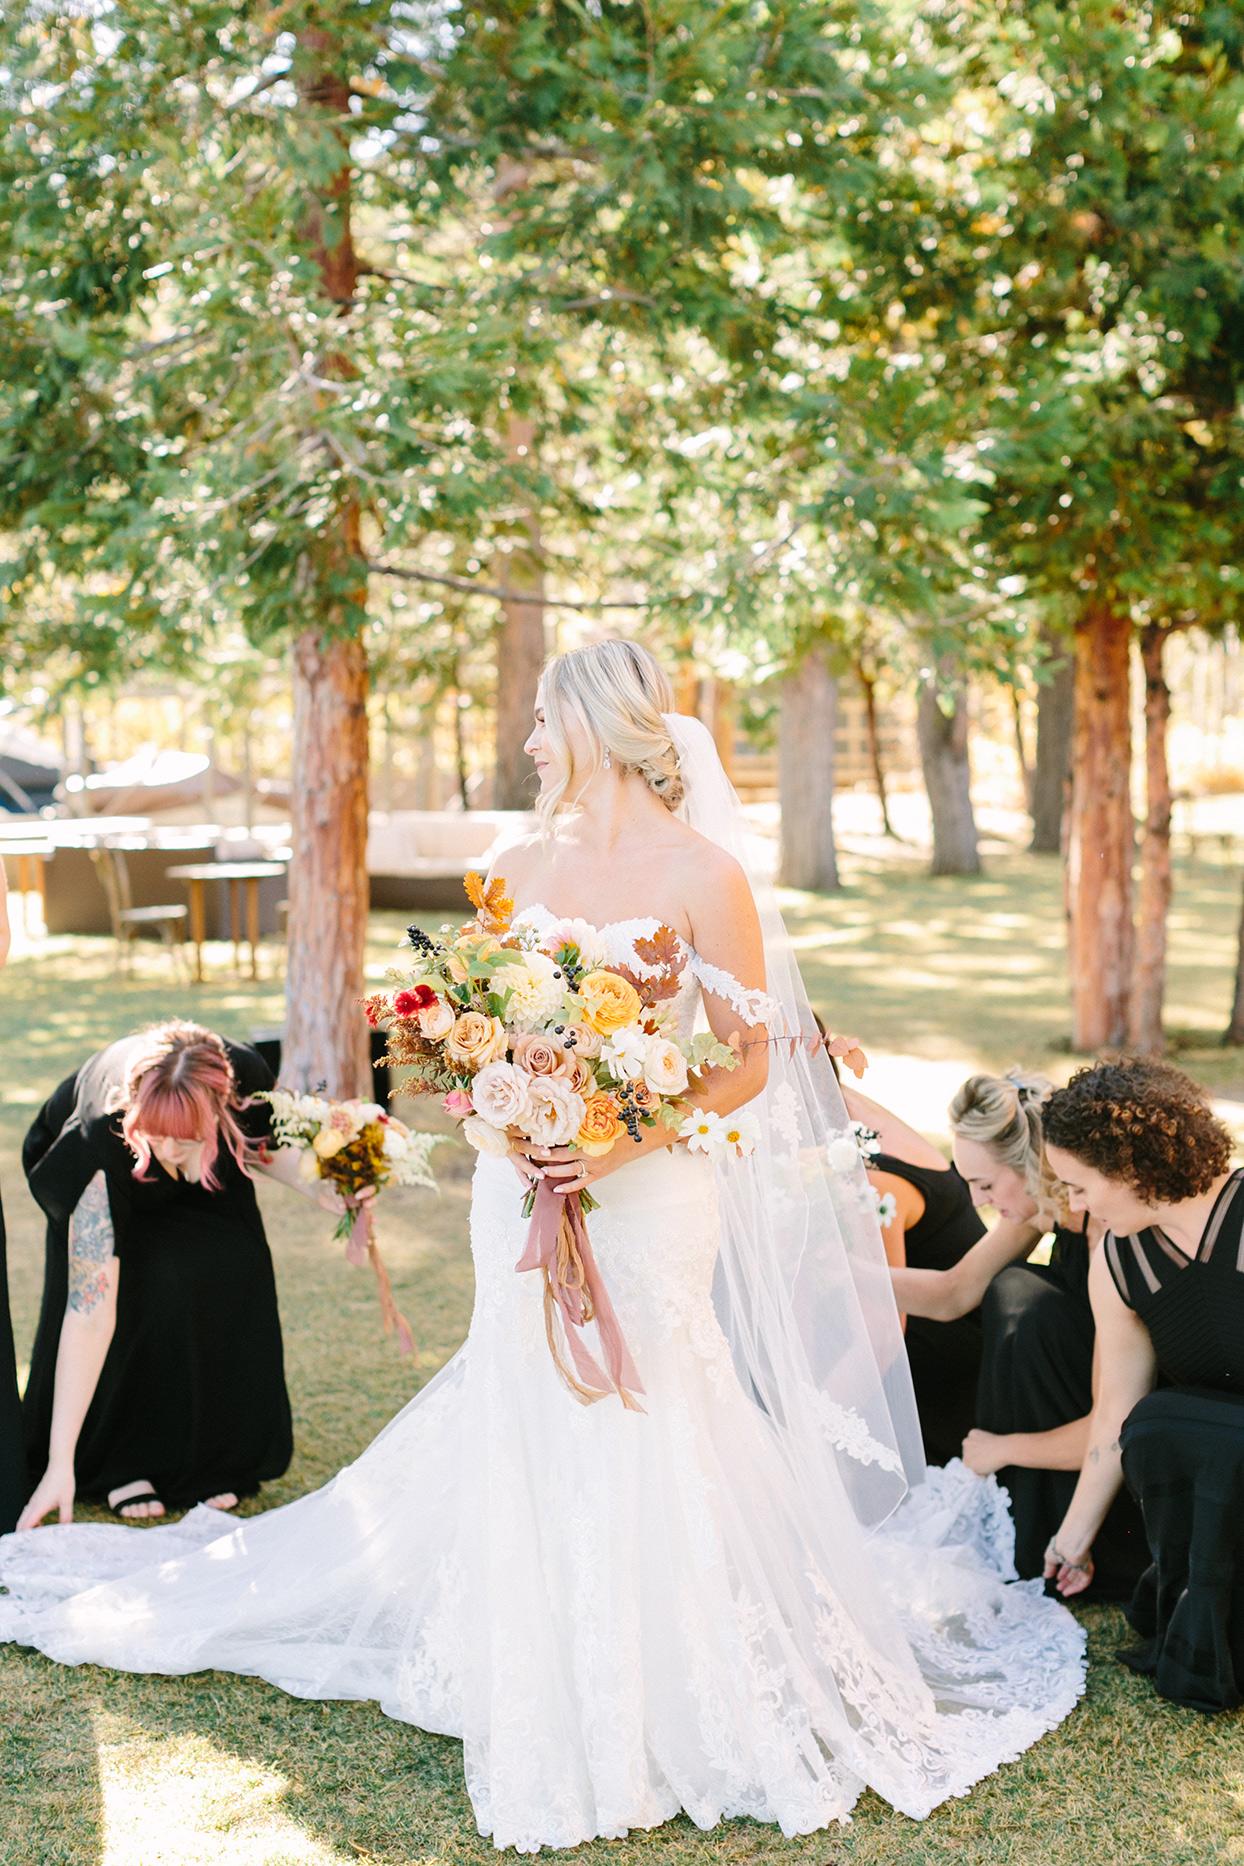 alexandra david wedding bride with maids adjusting dress